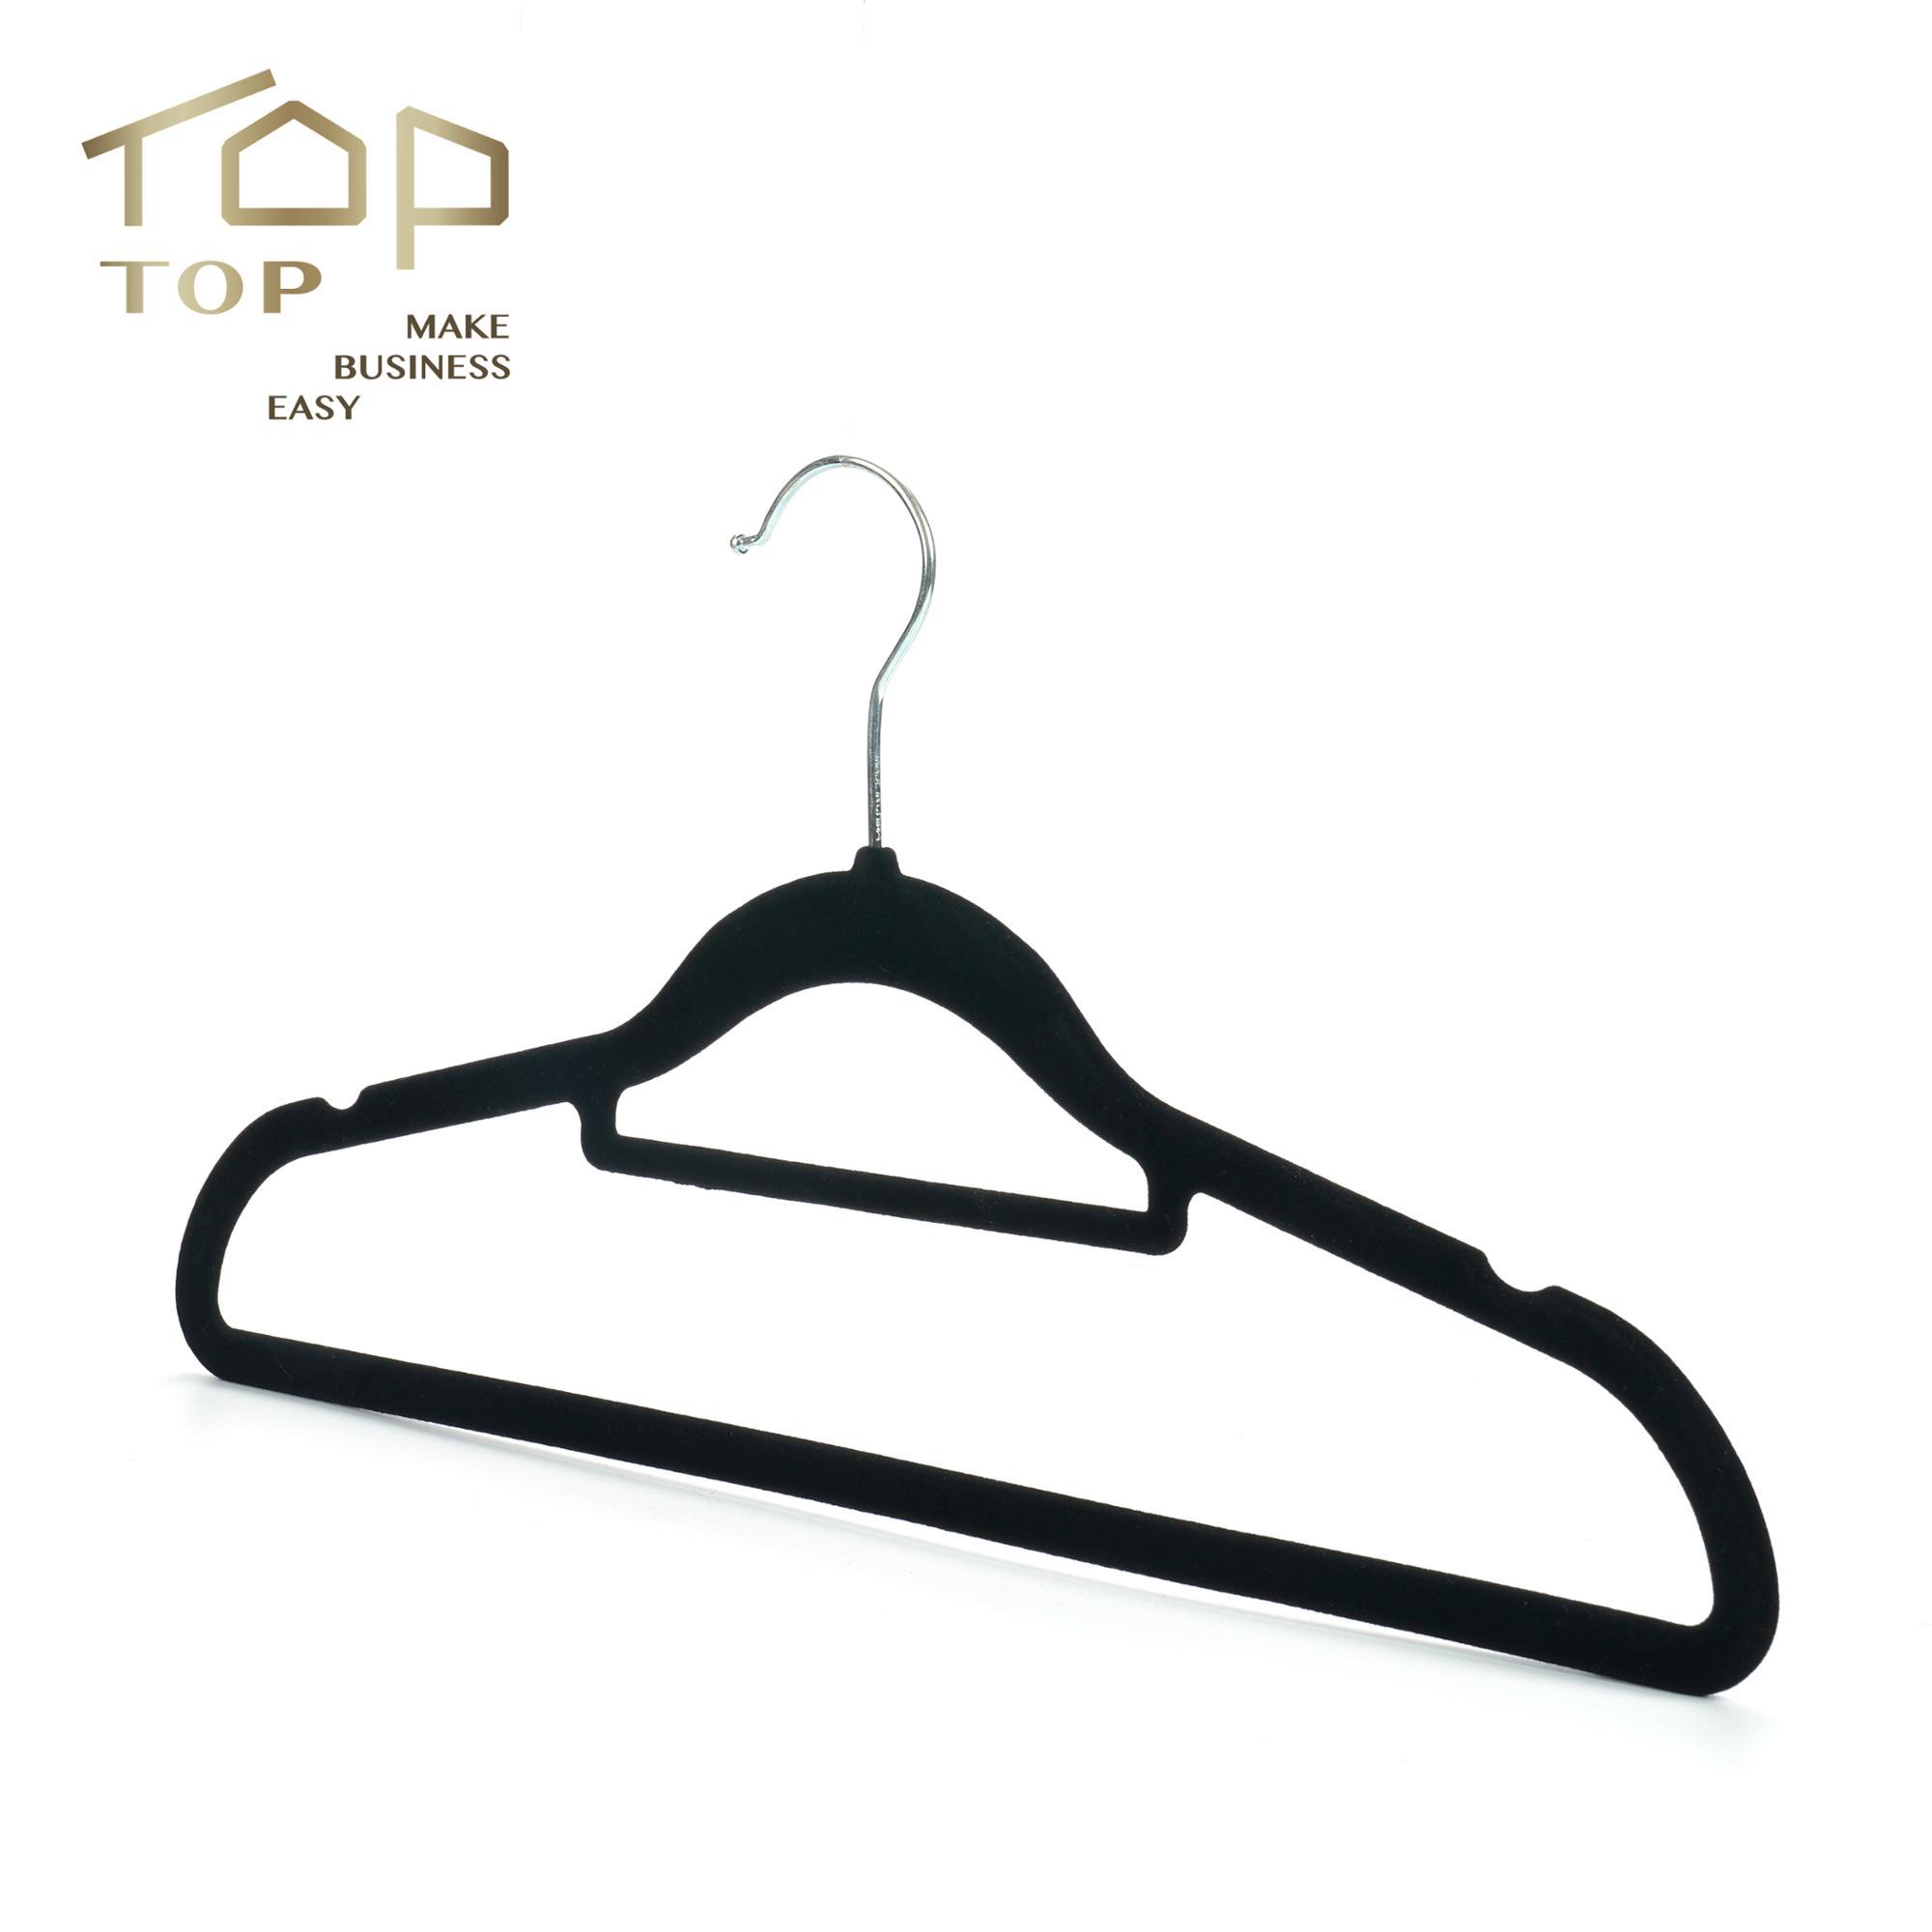 velvet clothes hangers follow - HD2000×2000